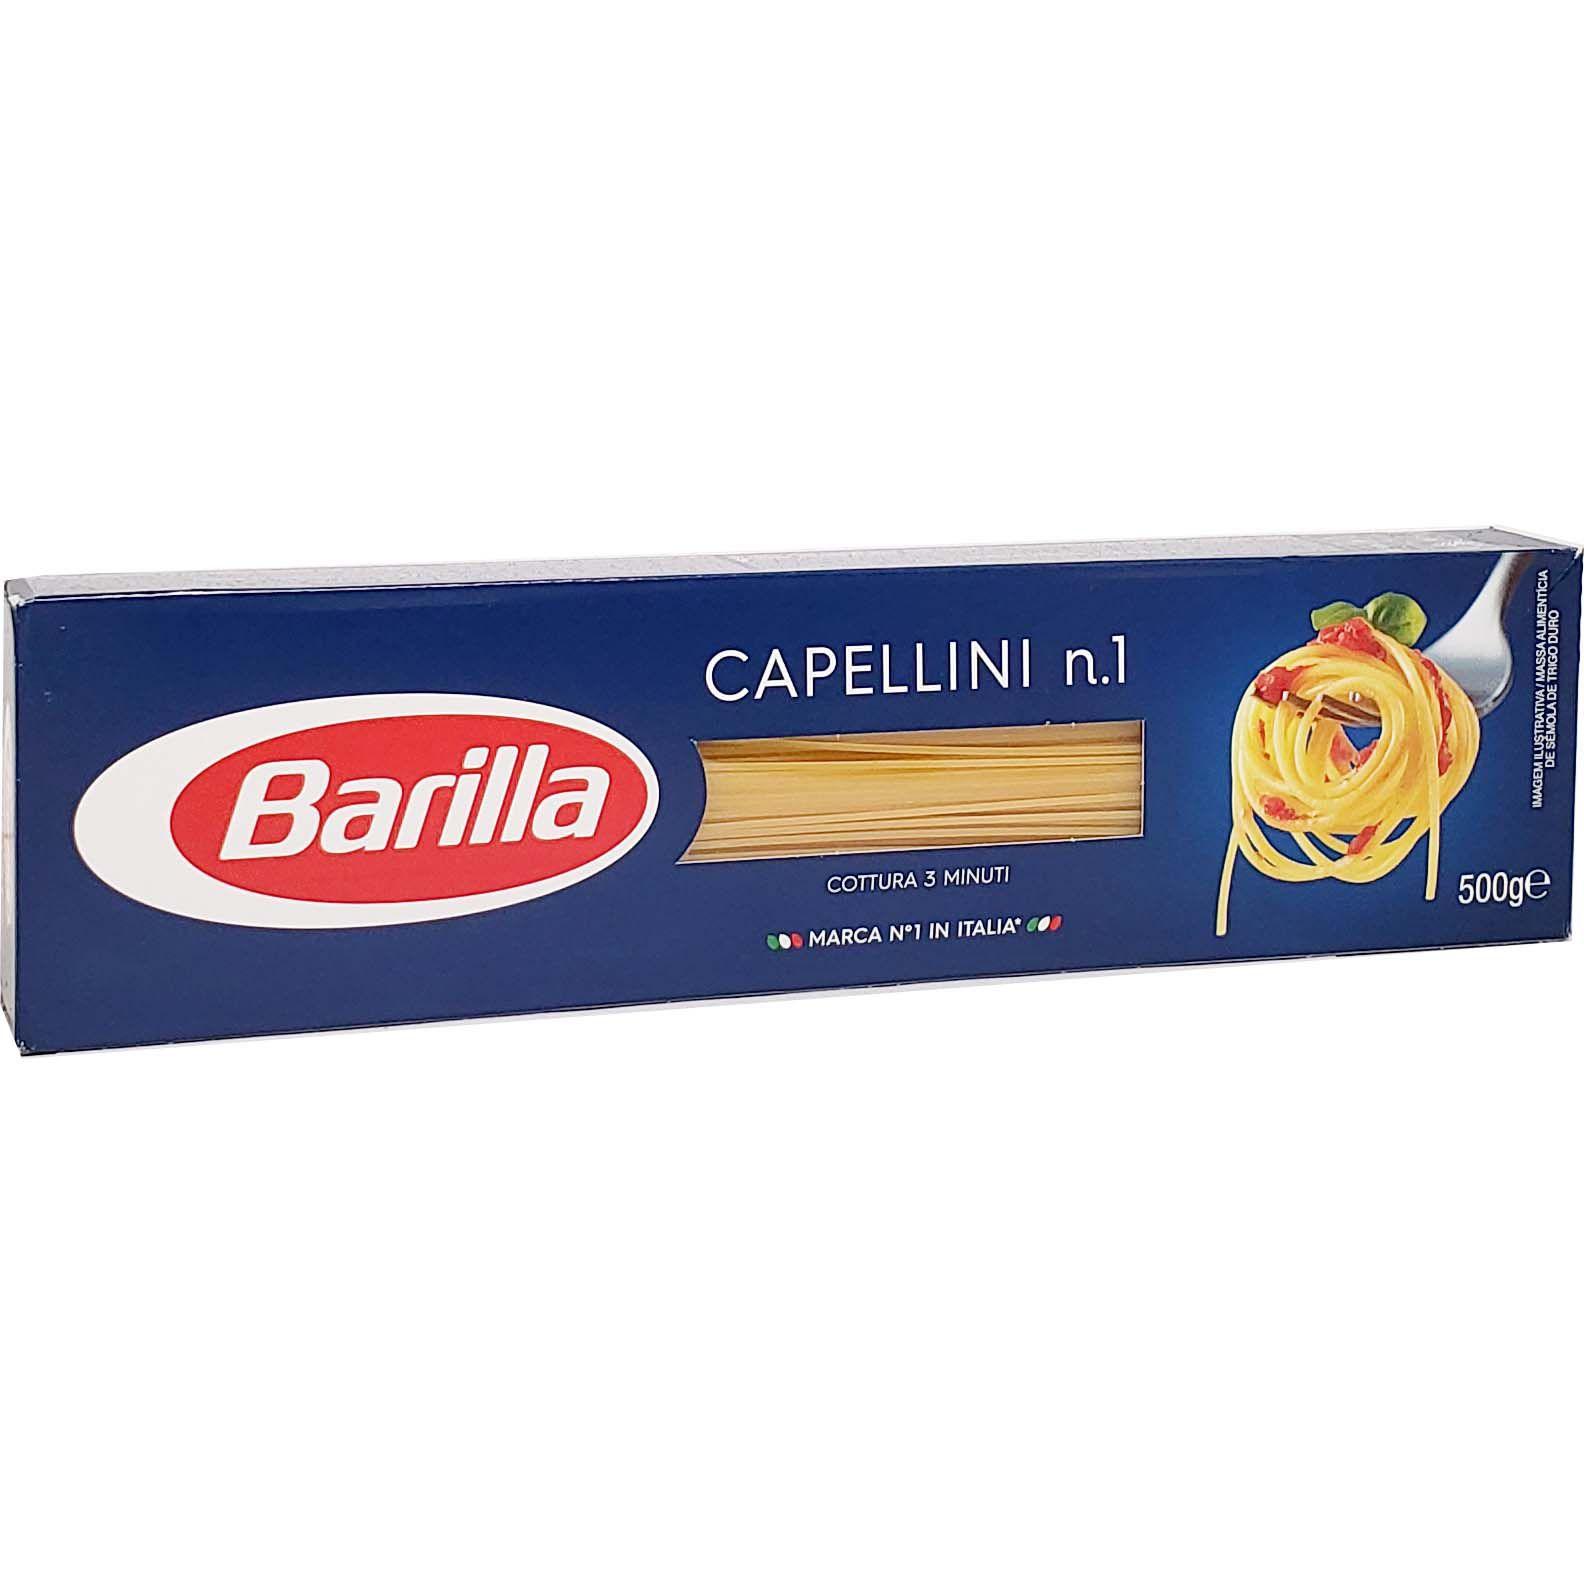 Macarrão Capellini n.1 Barilla - 500g -